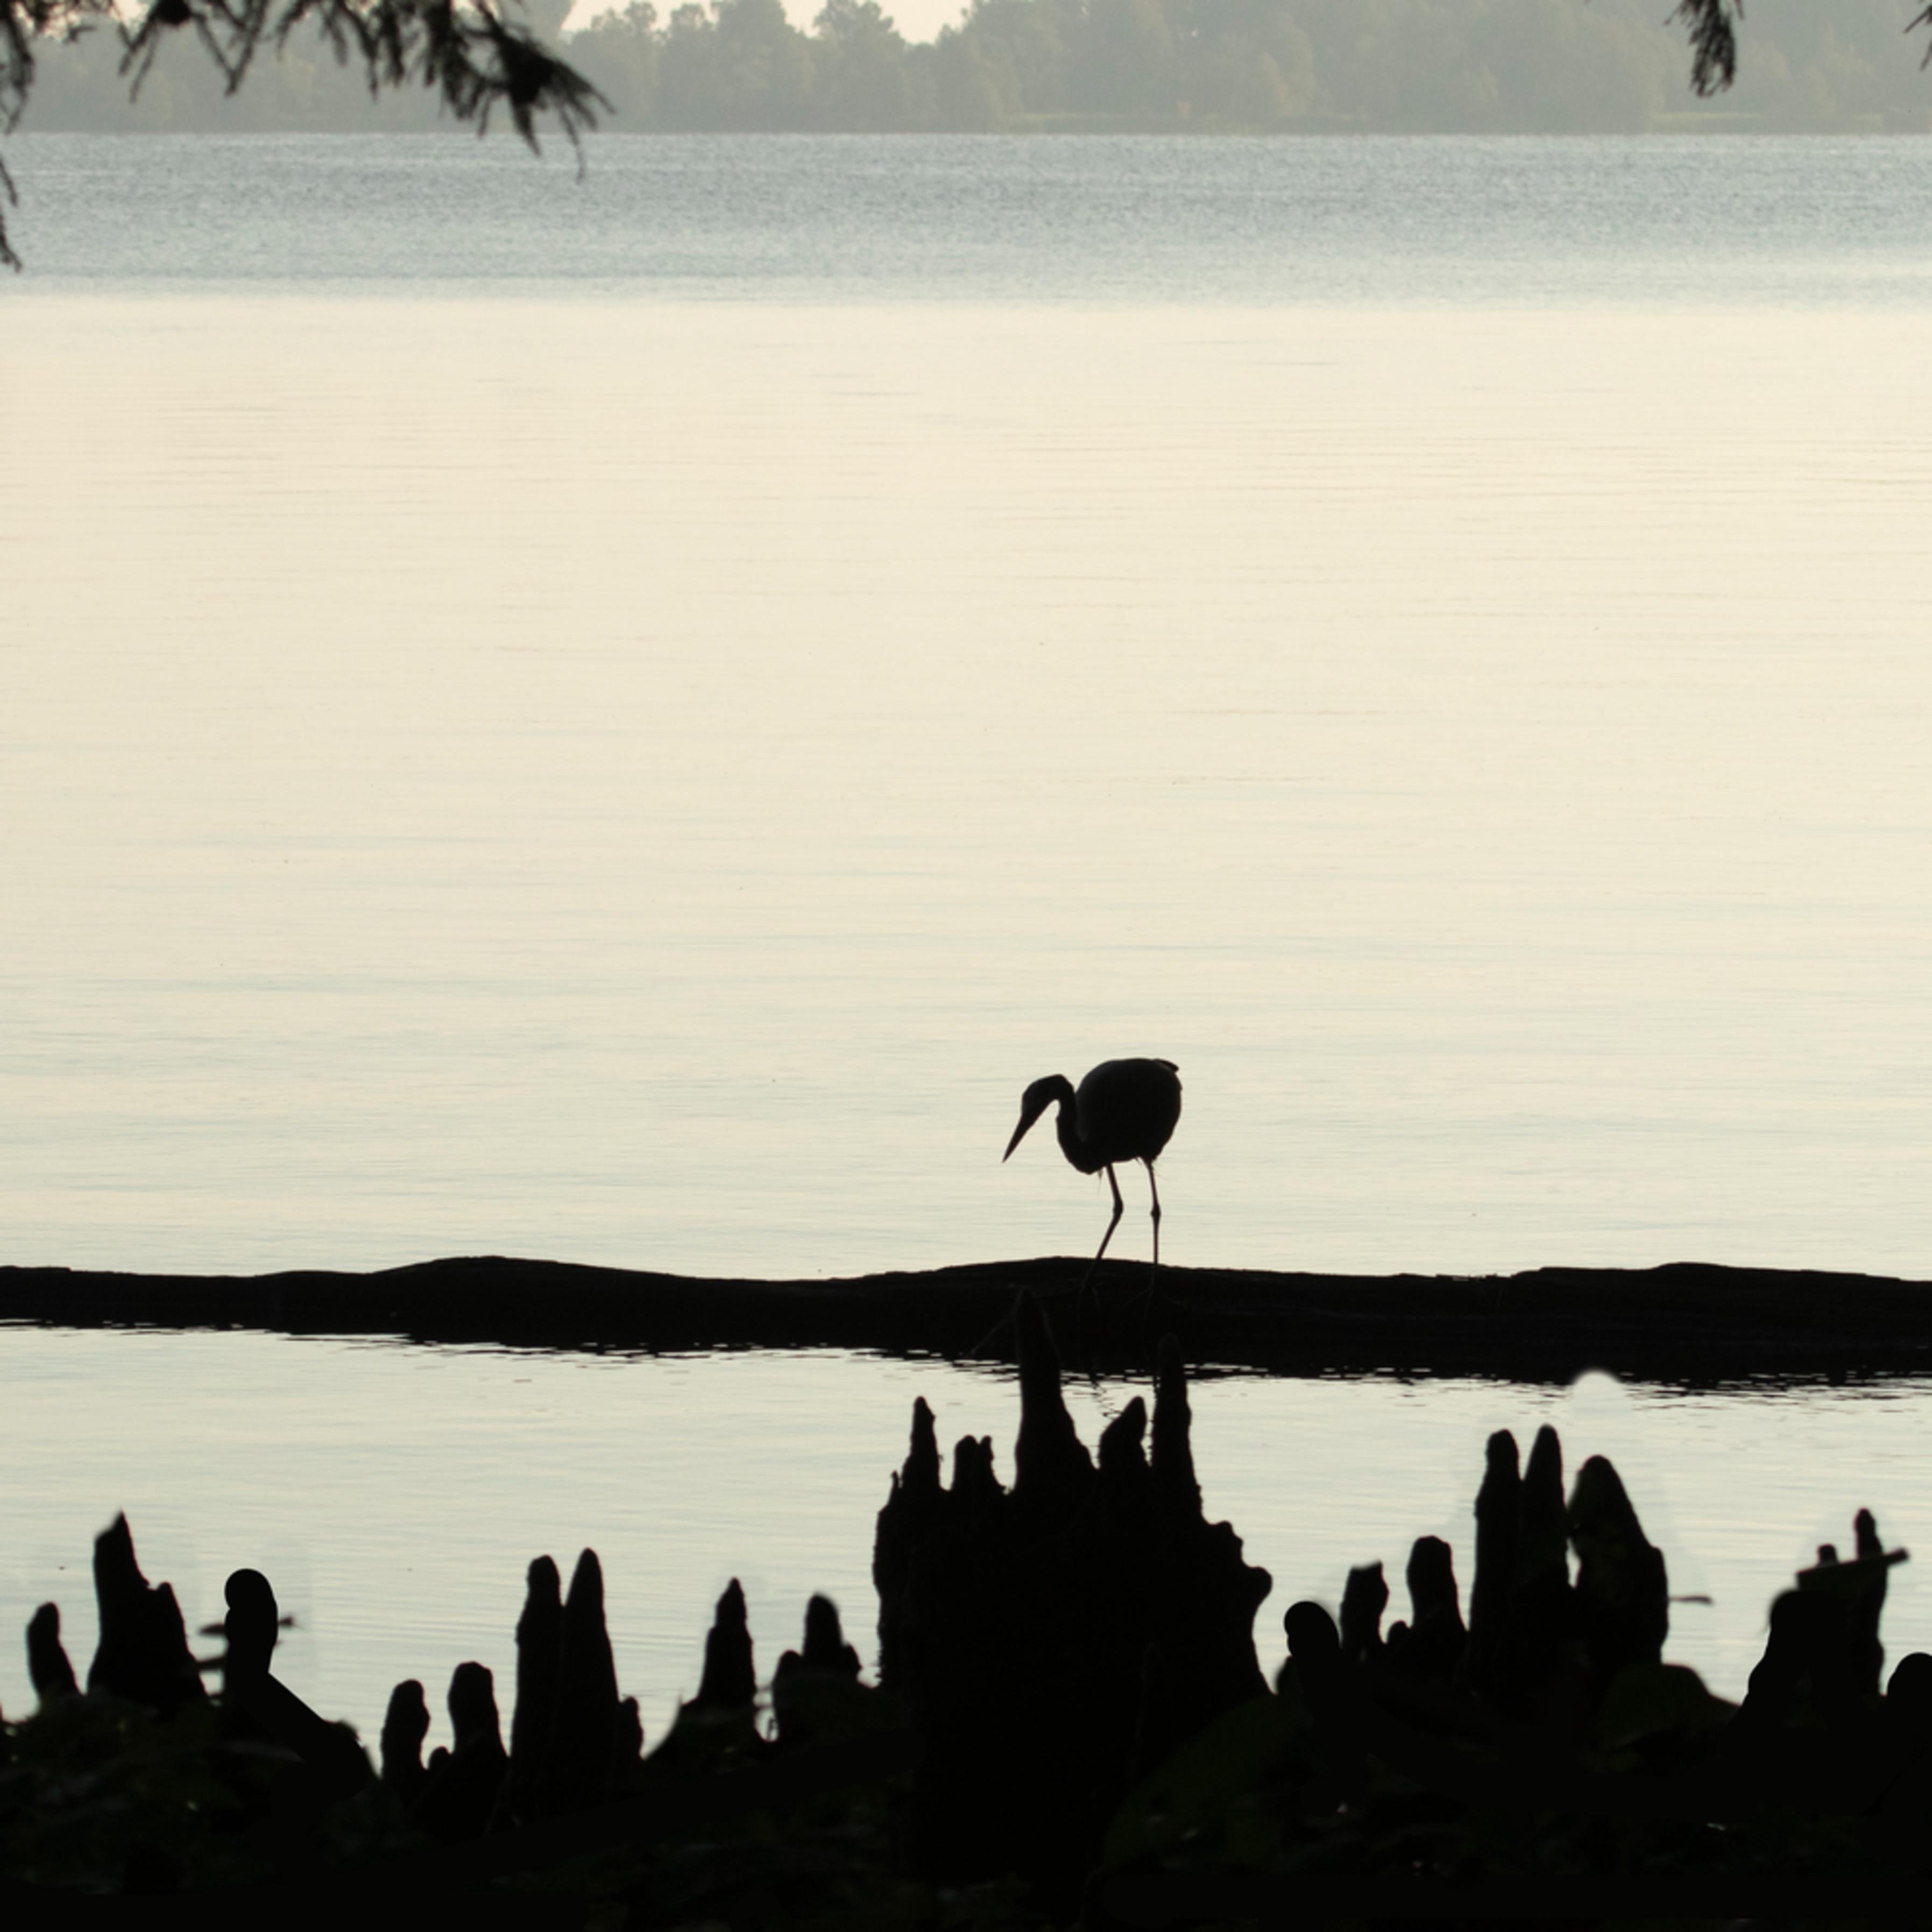 Heron silhouettes mg 7511 srm20 nxuhfh